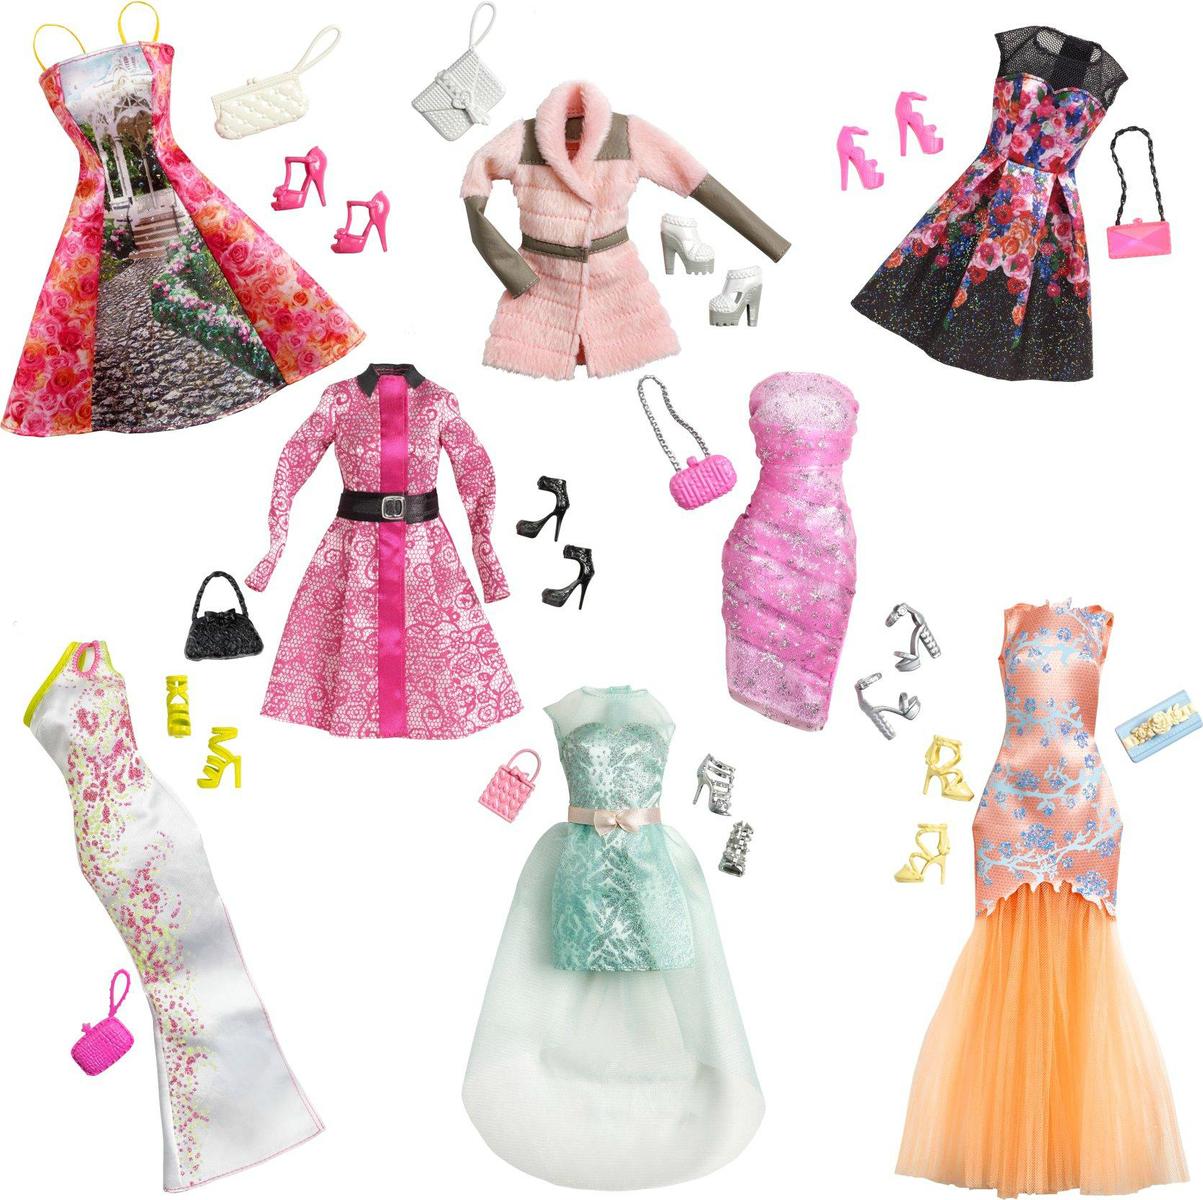 2b9668717eb7 Mattel Barbie Βραδινά Σύνολα - Διάφορα Σχέδια - Skroutz.gr